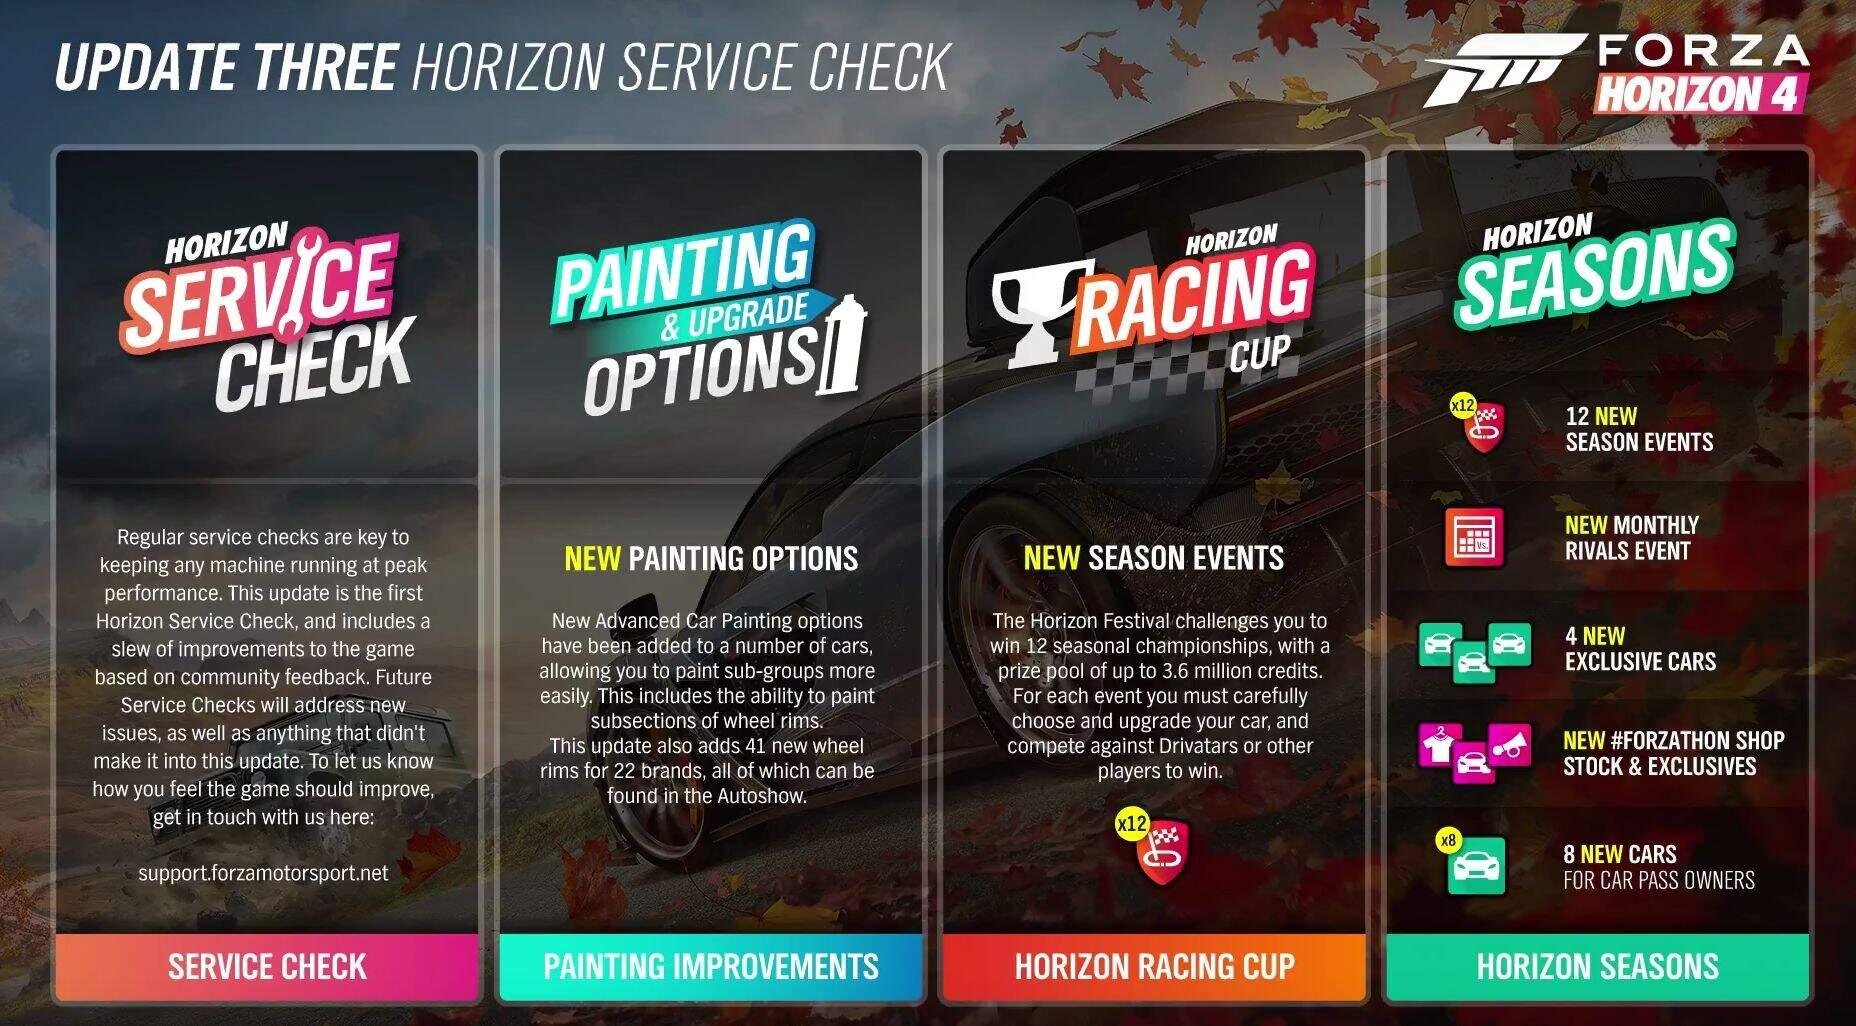 Forza Horizon 4 Service Check Update